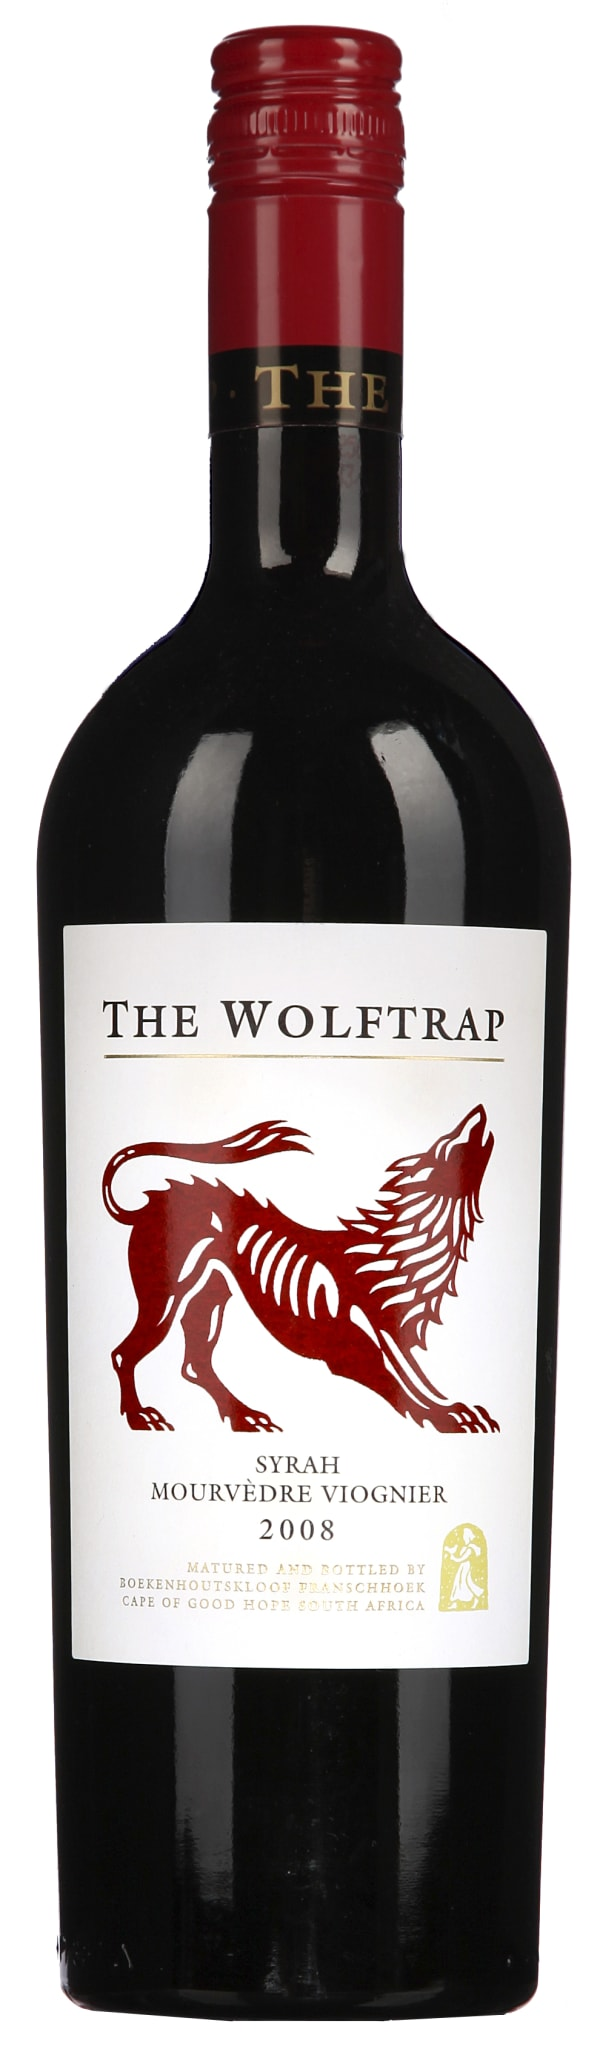 The Wolftrap Syrah Mourvèdre Viognier 2016